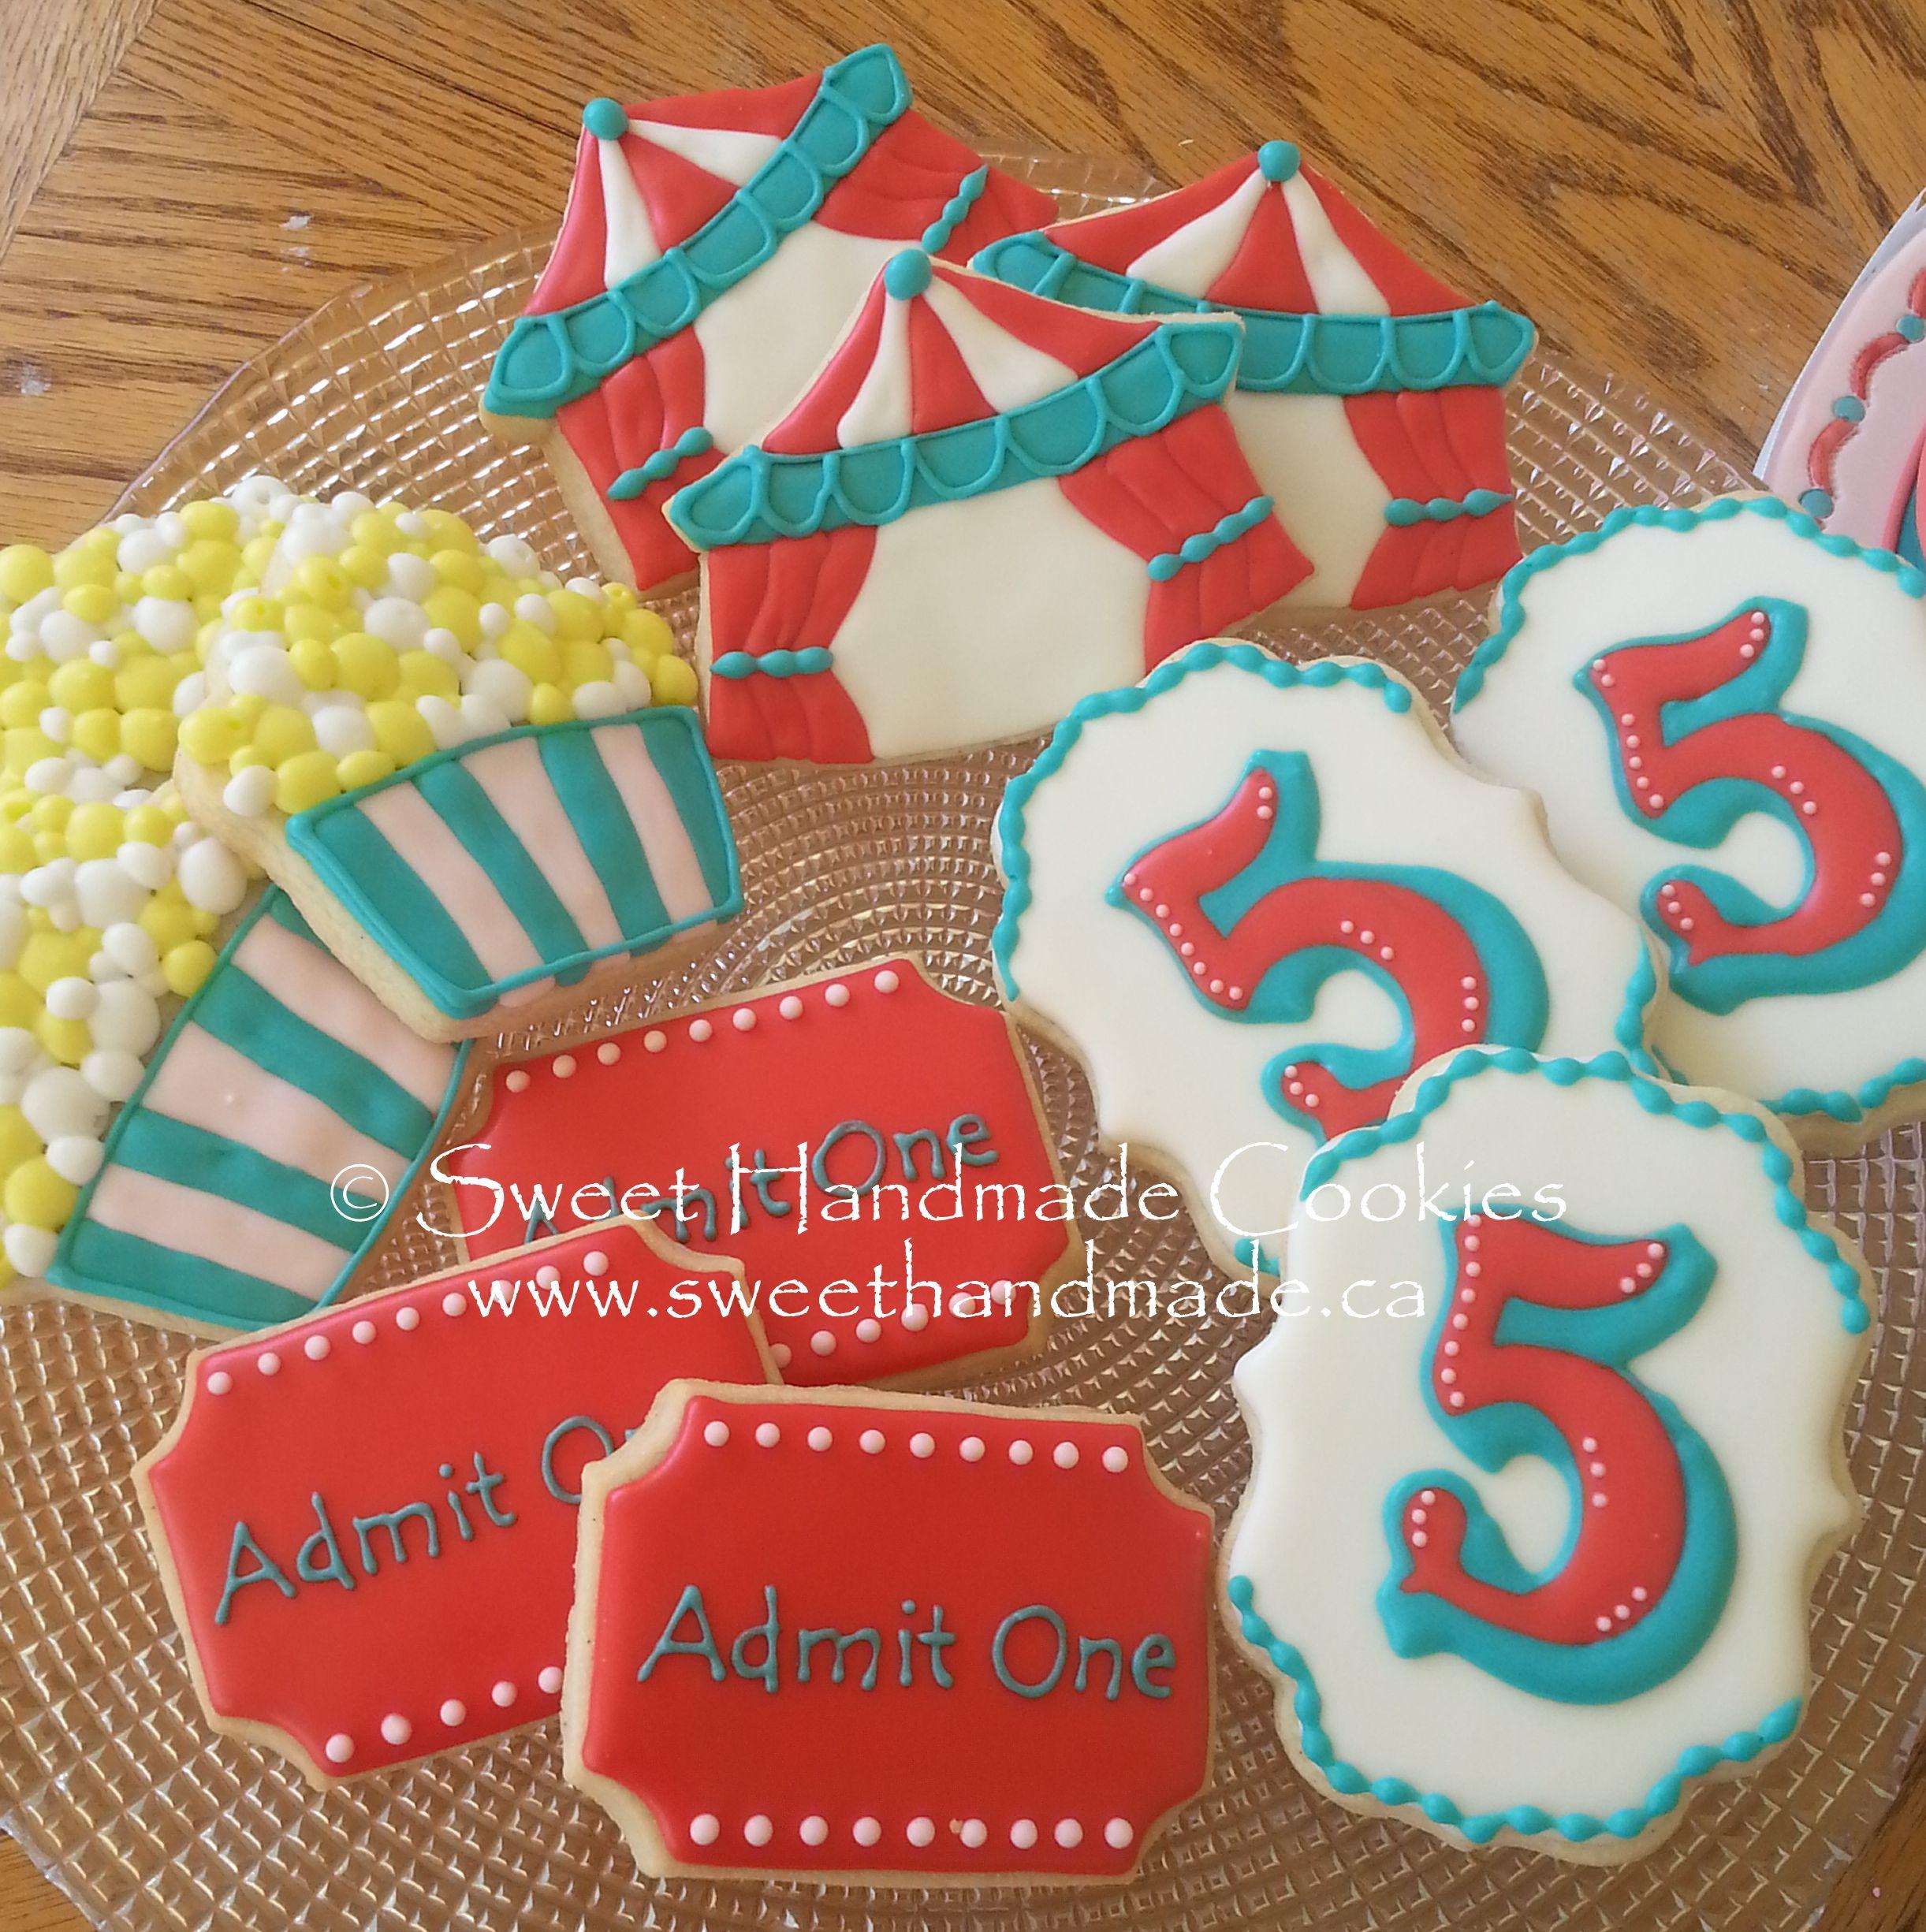 Sweet Handmade Cookies carnival circus ticket  5  birthday tent popcorn cookies  sc 1 st  Pinterest & Sweet Handmade Cookies: carnival circus ticket